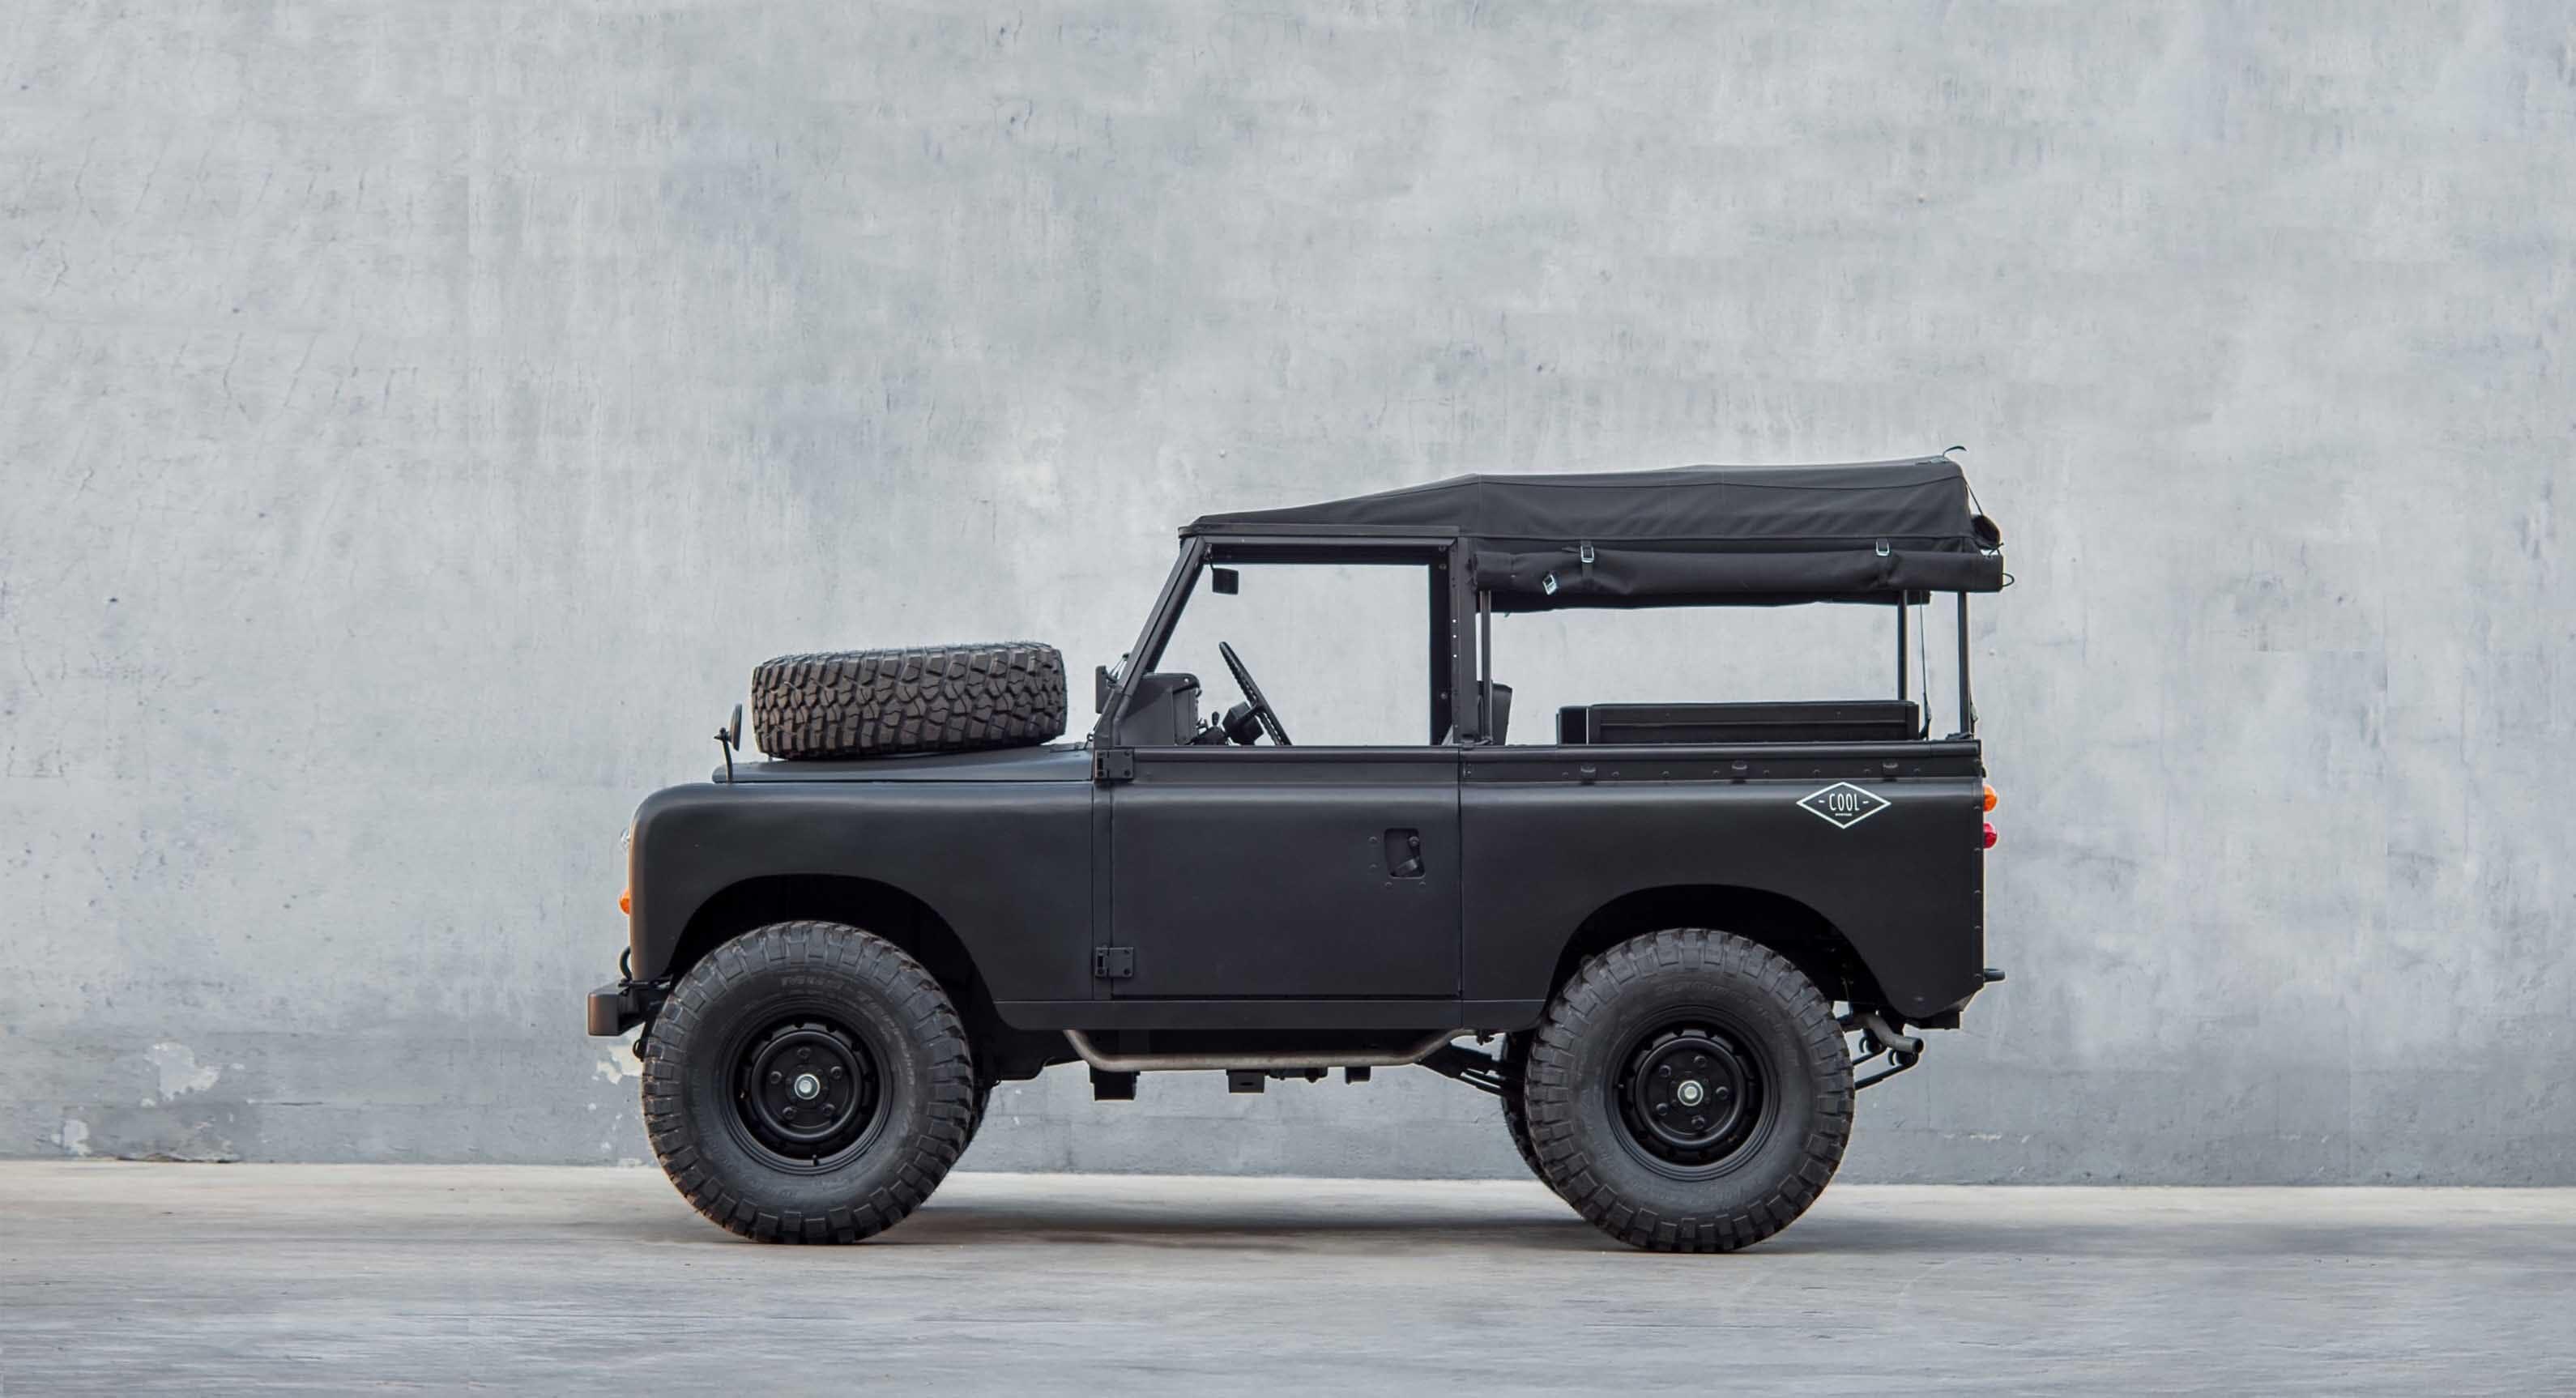 1979 Land Rover Series 3 Defender Black By Cool & Vintage